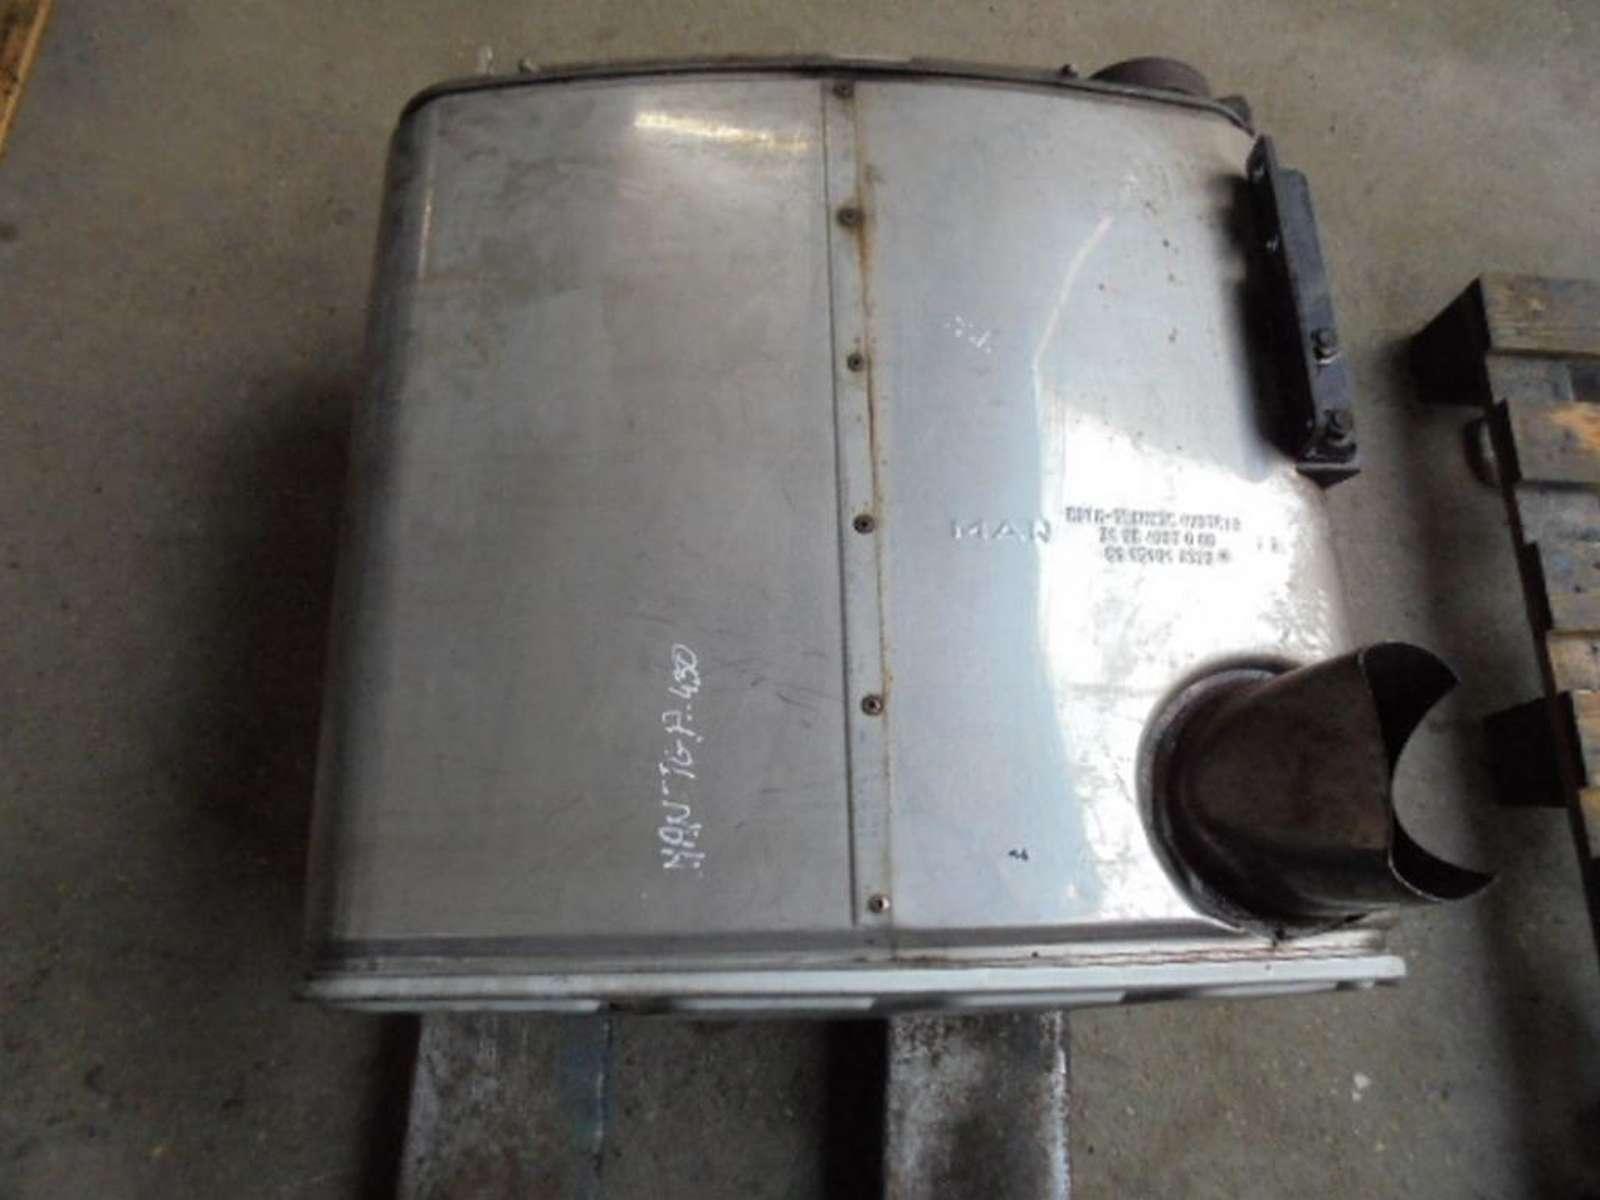 Katalizator 31984067000/811510100370/MAN/METAL/CALOSC